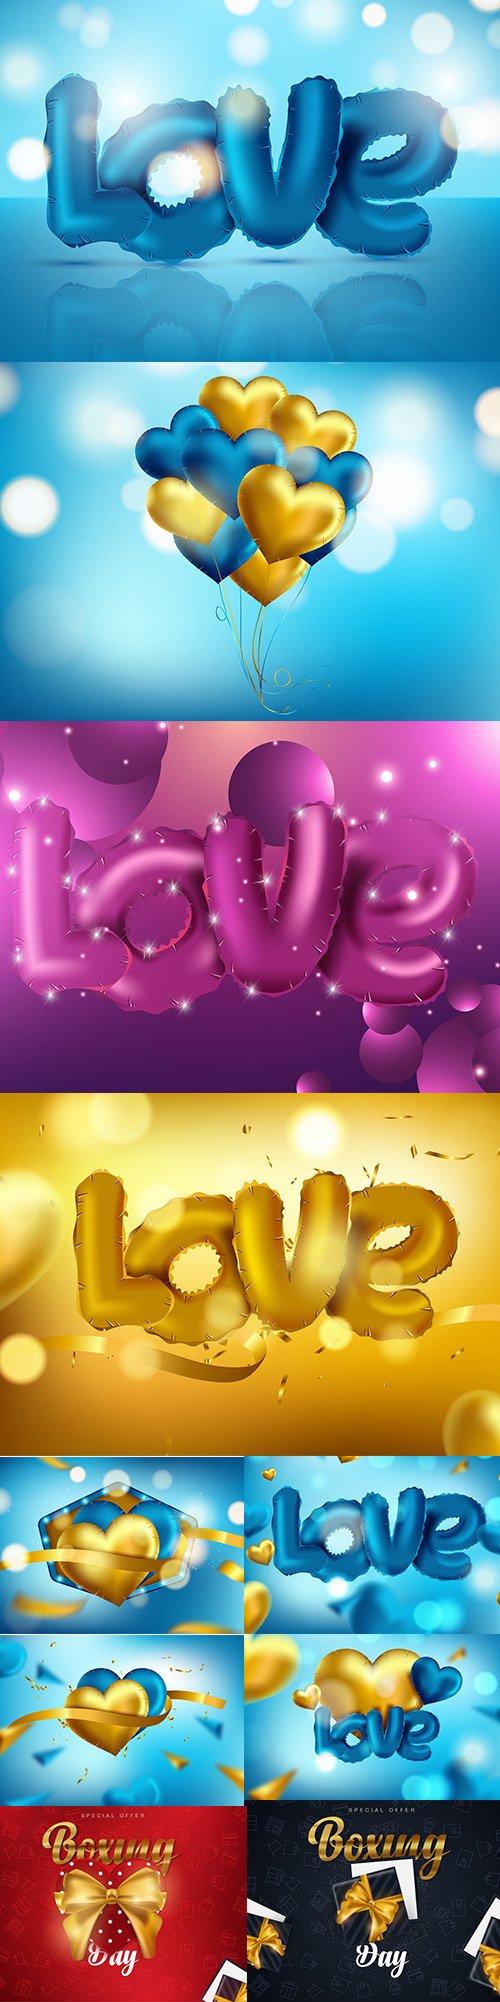 Set of Romantic Valentines Day Illustrations Vol 13